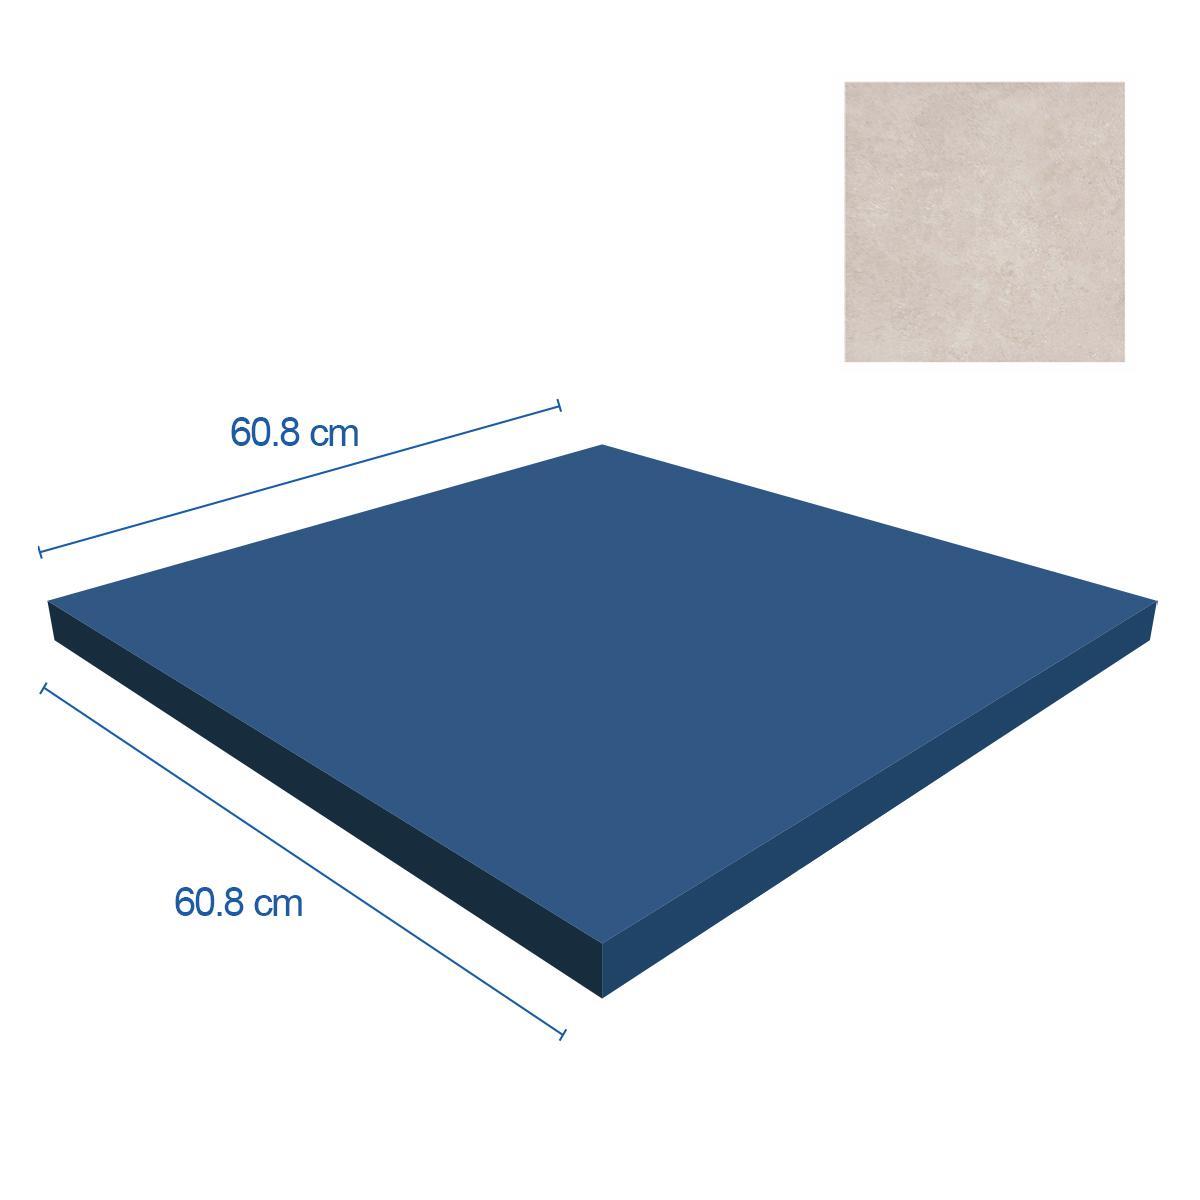 Porcelanato Sena Marfil Mate - 60.8X60.8 cm - 1.48 m2